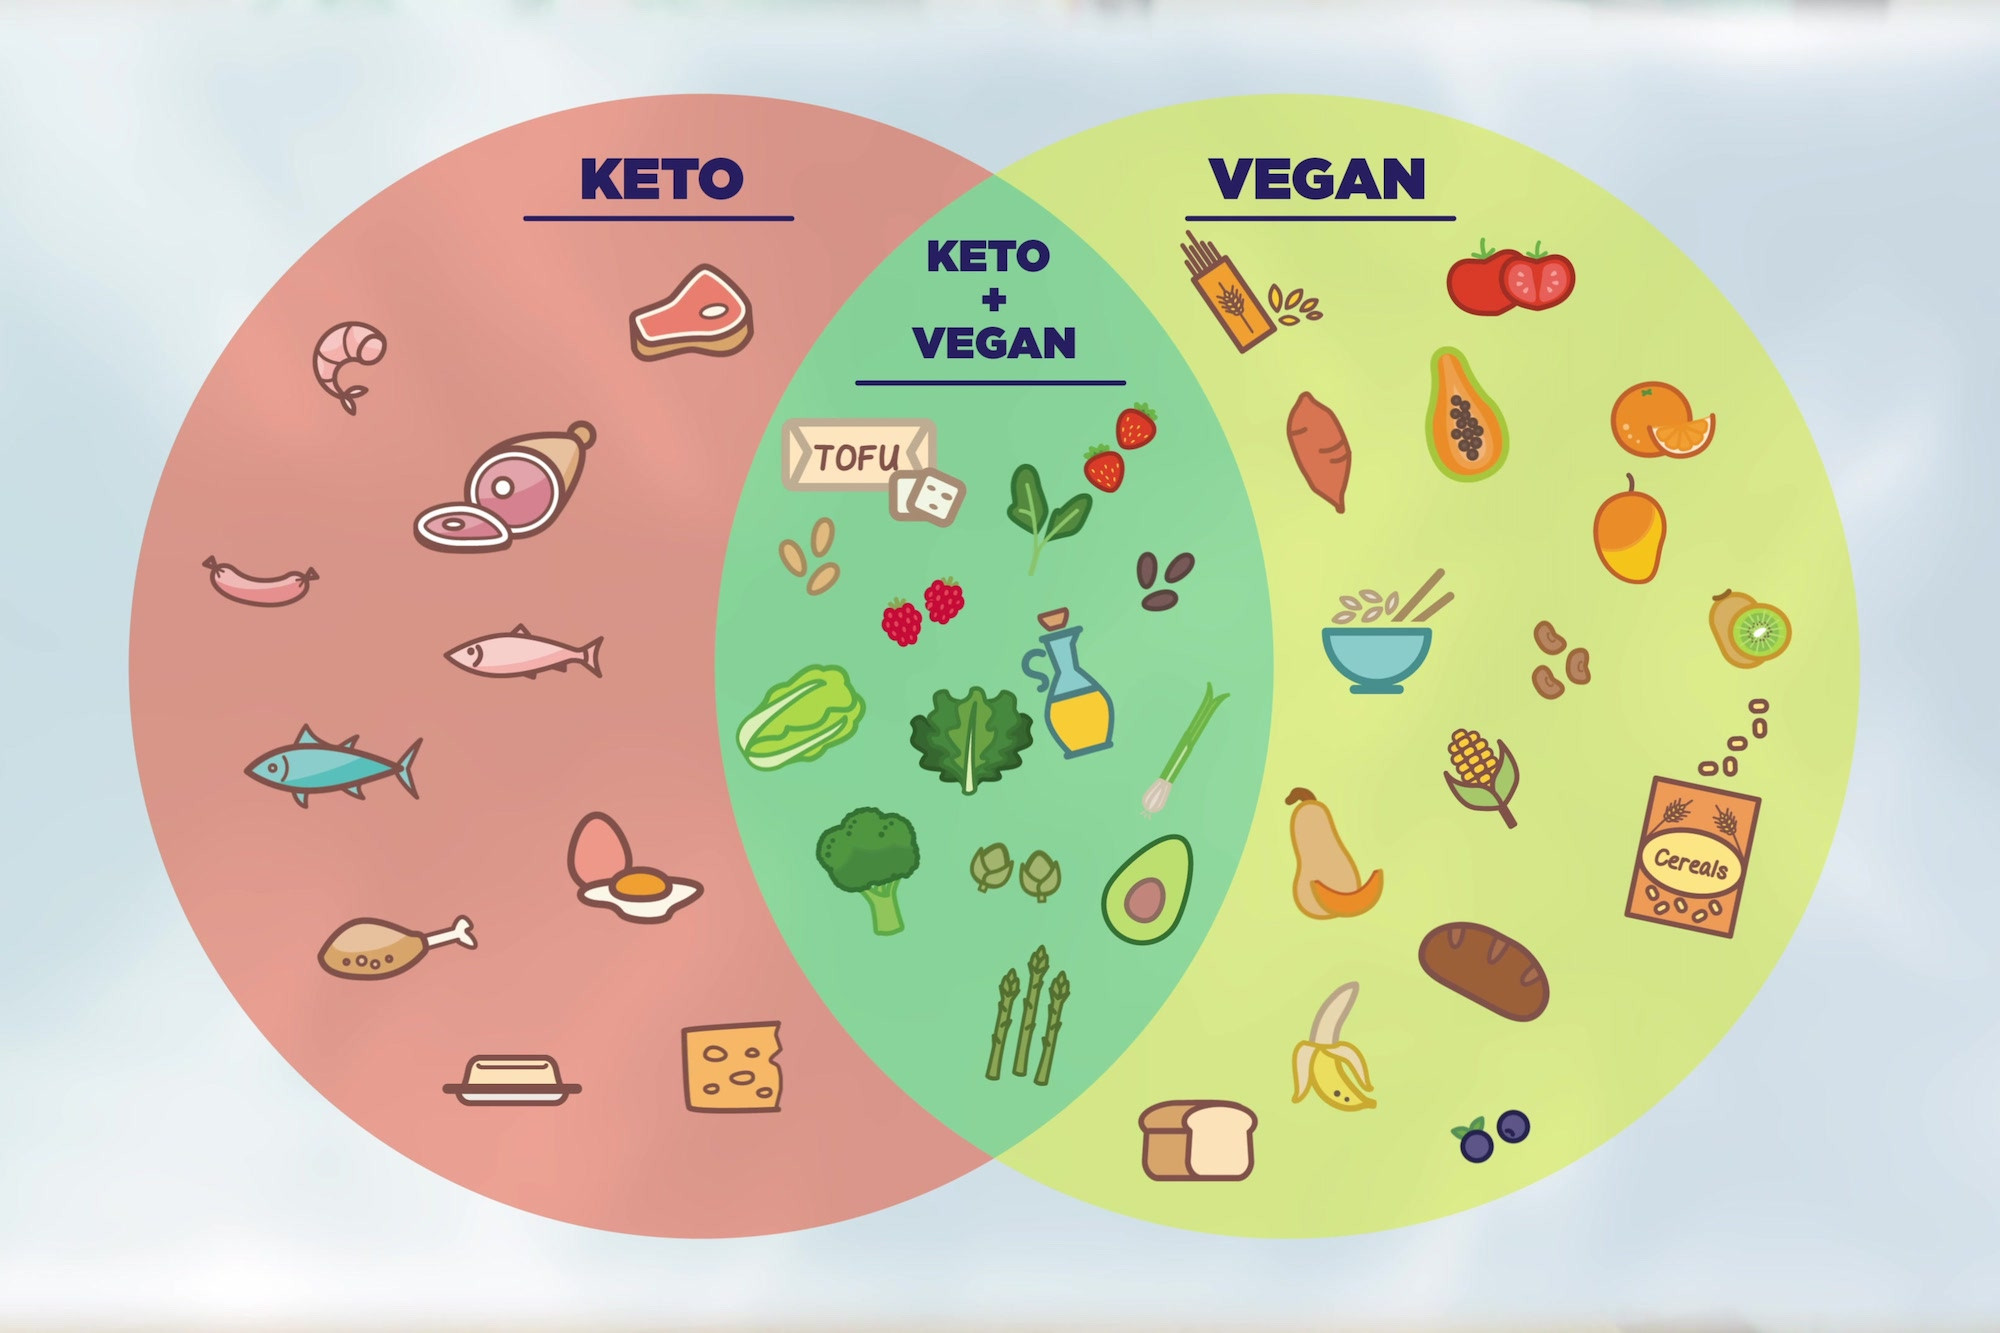 Keto Diet Vegan Plan  Keto vs Vegan Foods